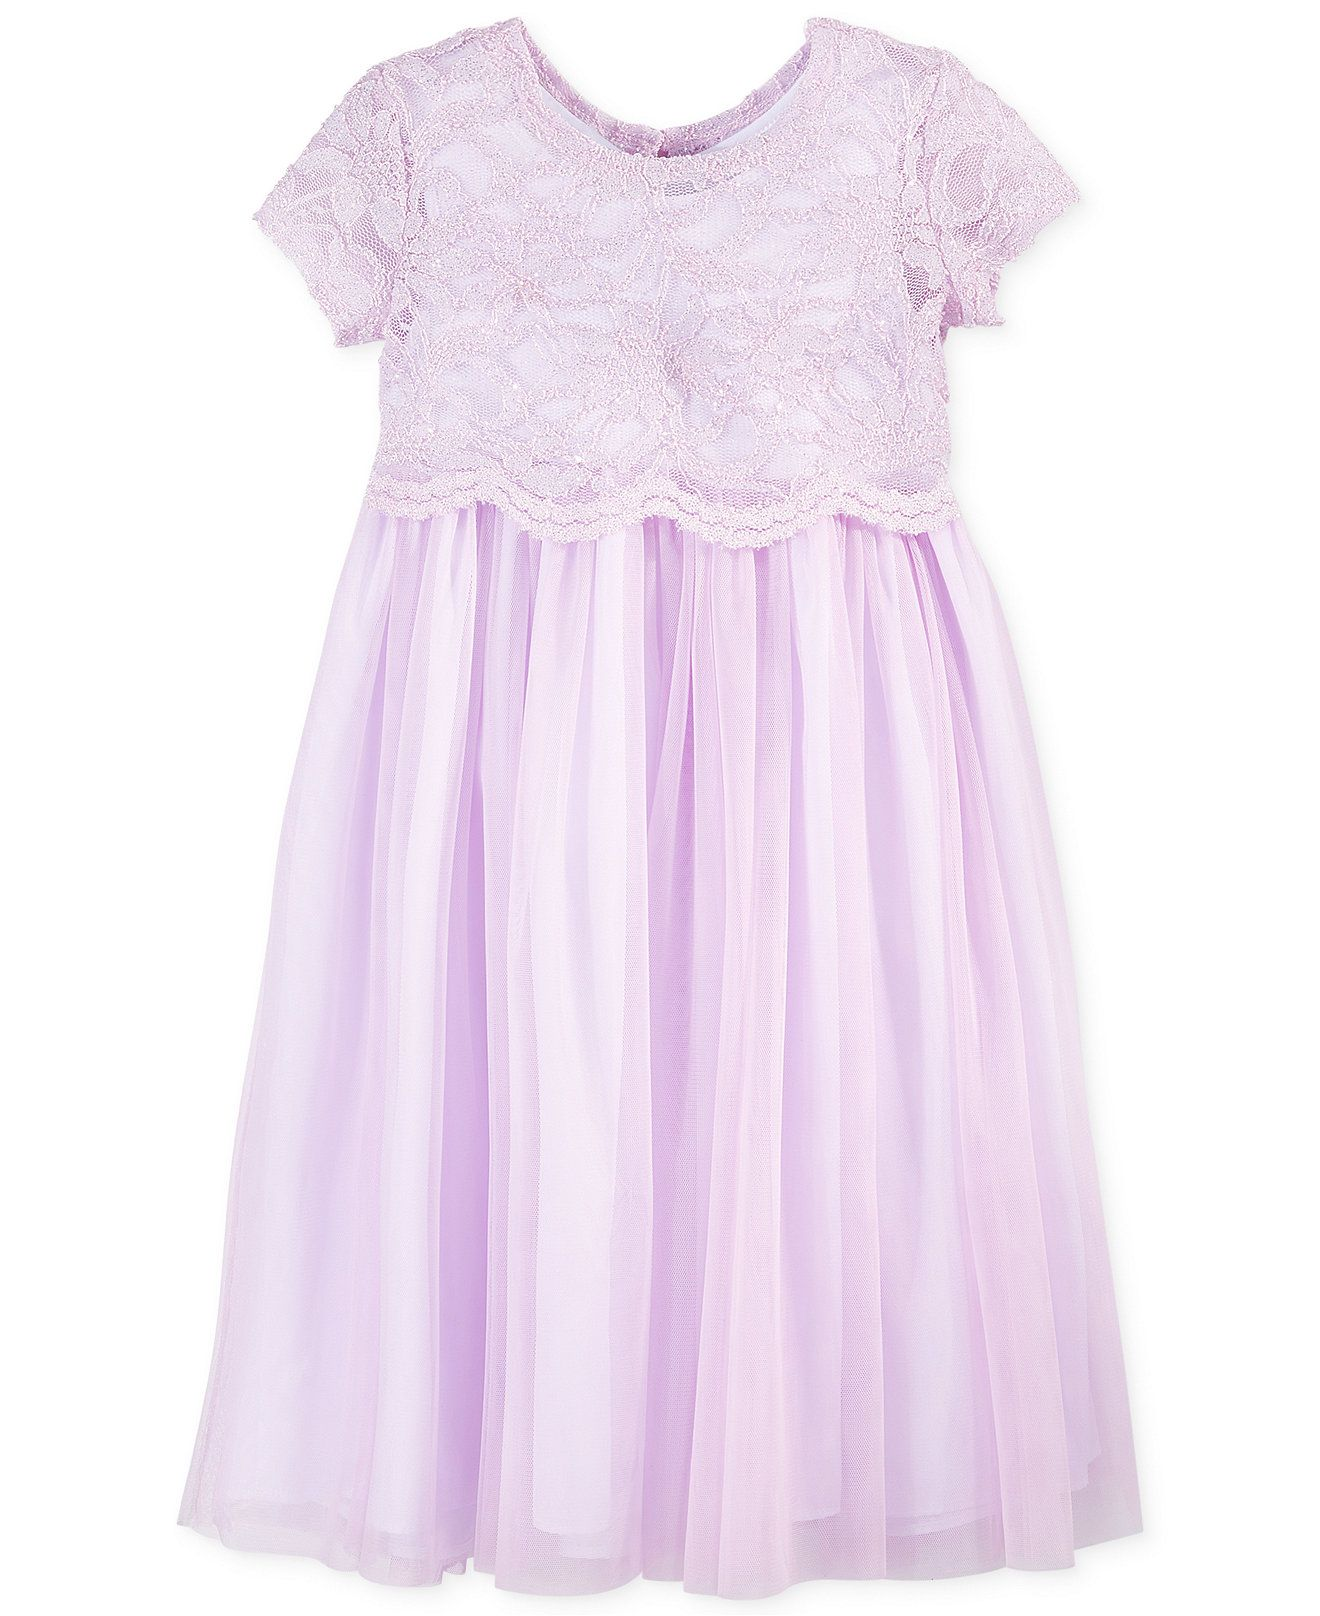 Bella by Marmellata Little Girls Lace Popover Dress Kids Girls